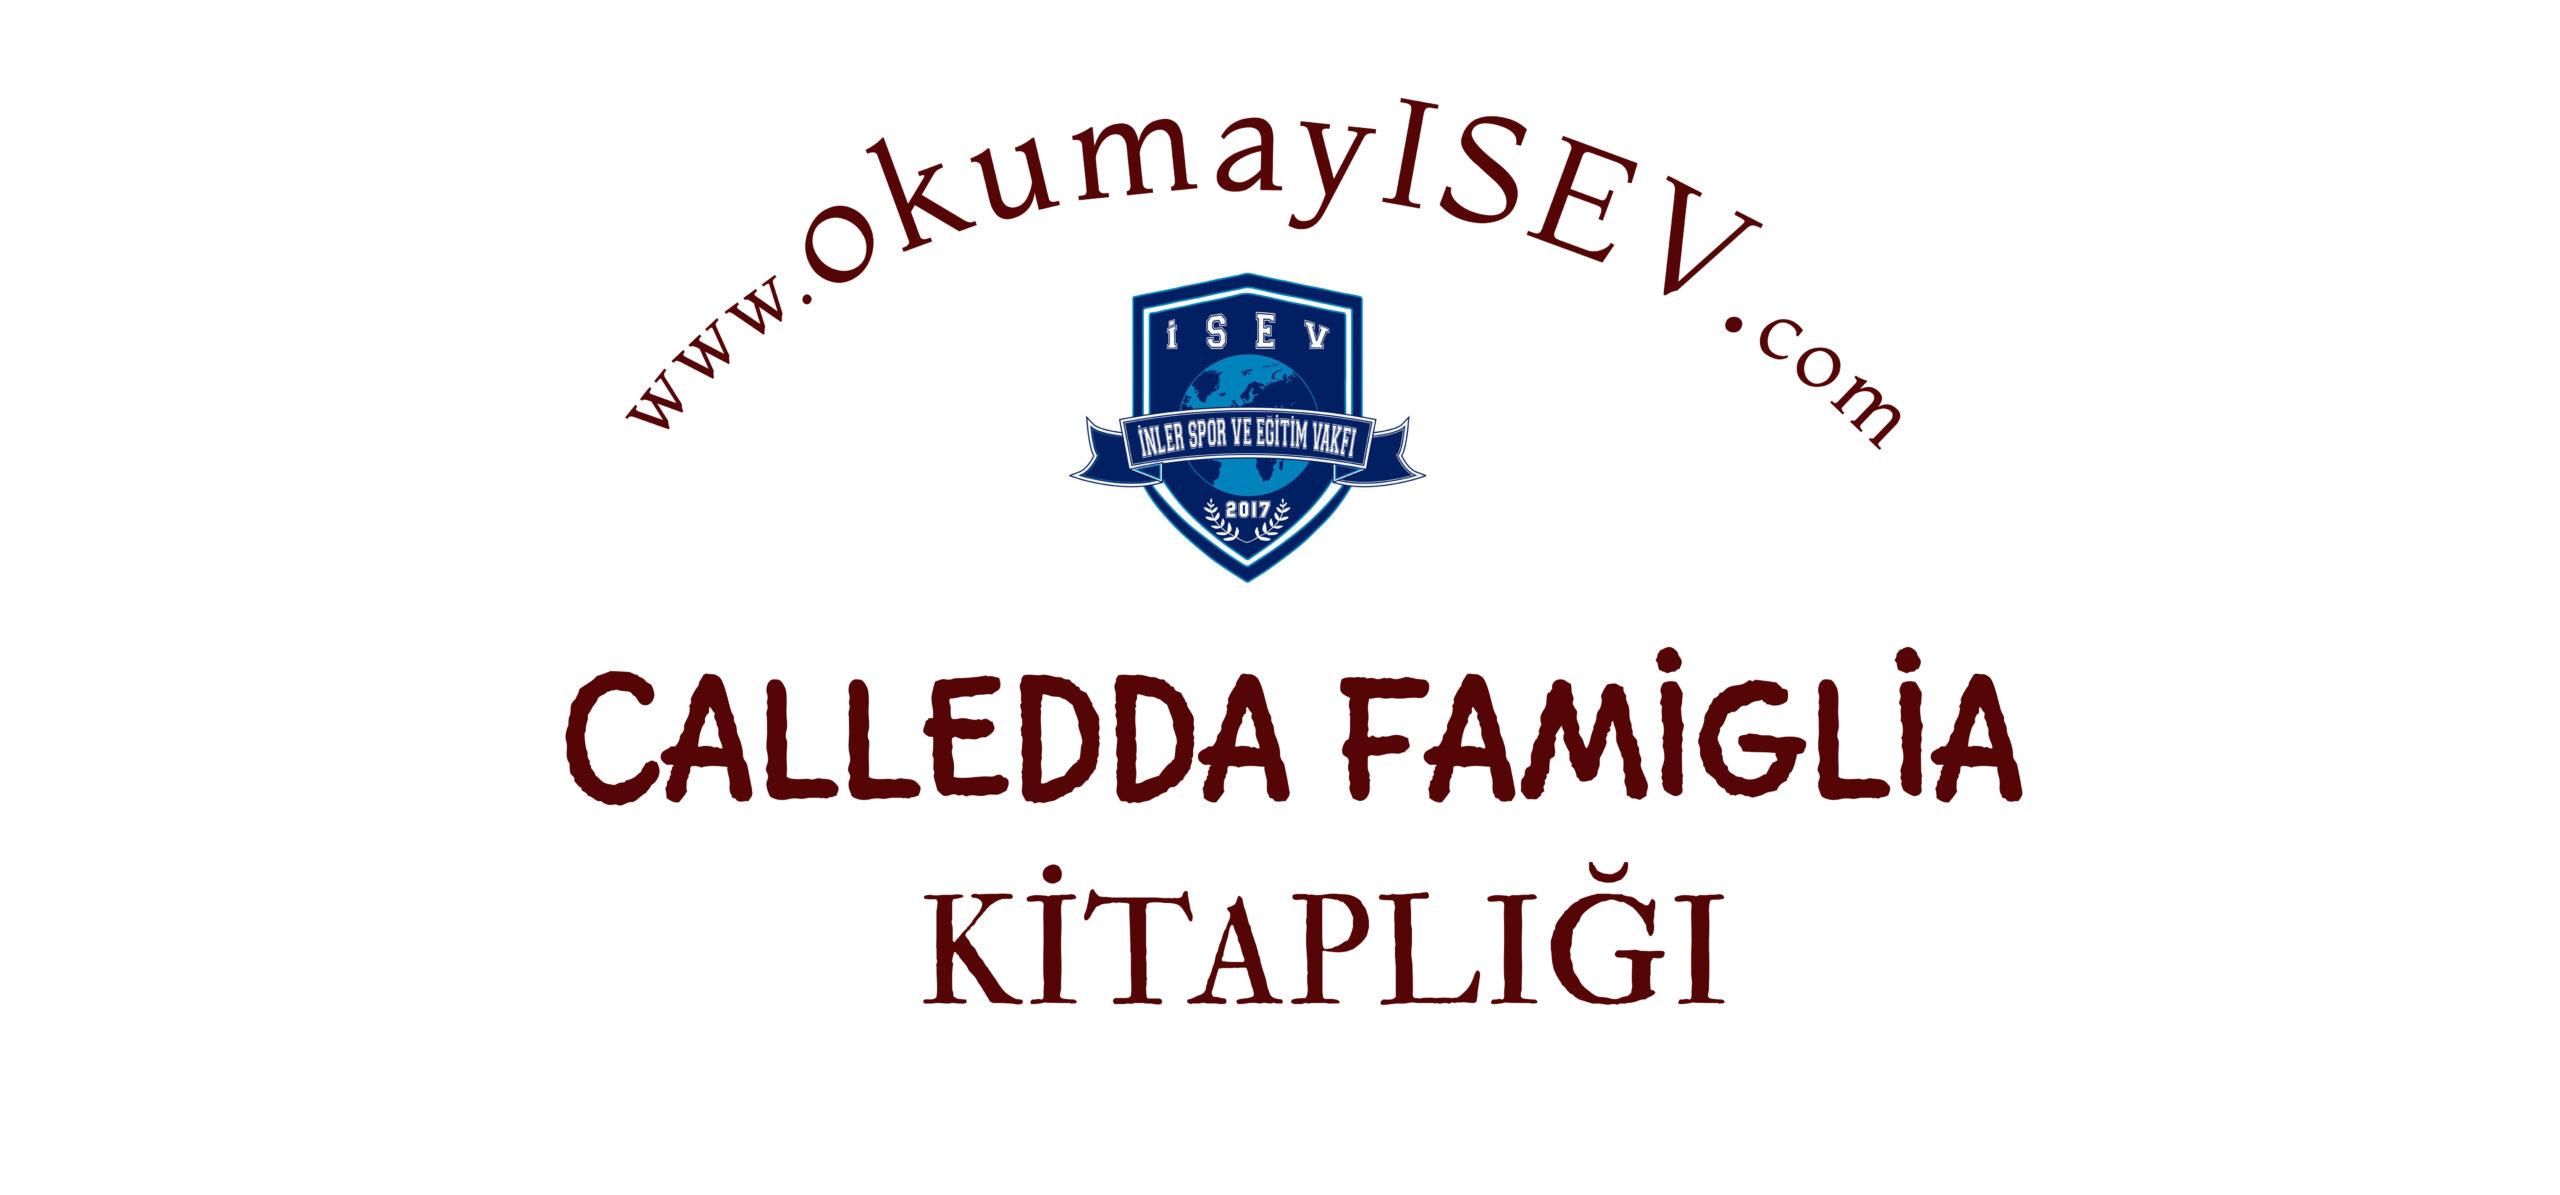 Calledda Famiglia Kitaplığı